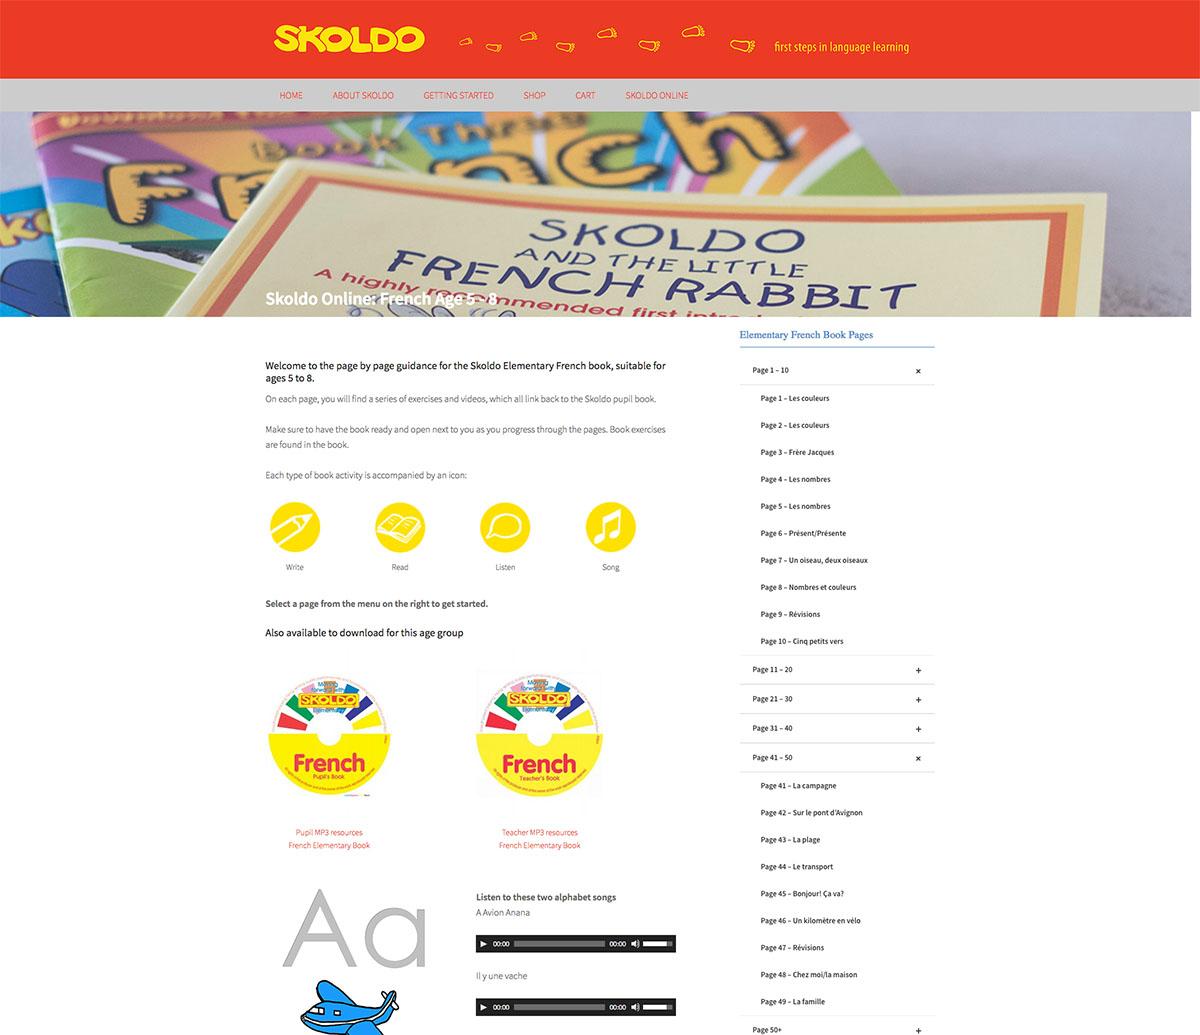 Skyewebsites Skoldo Website